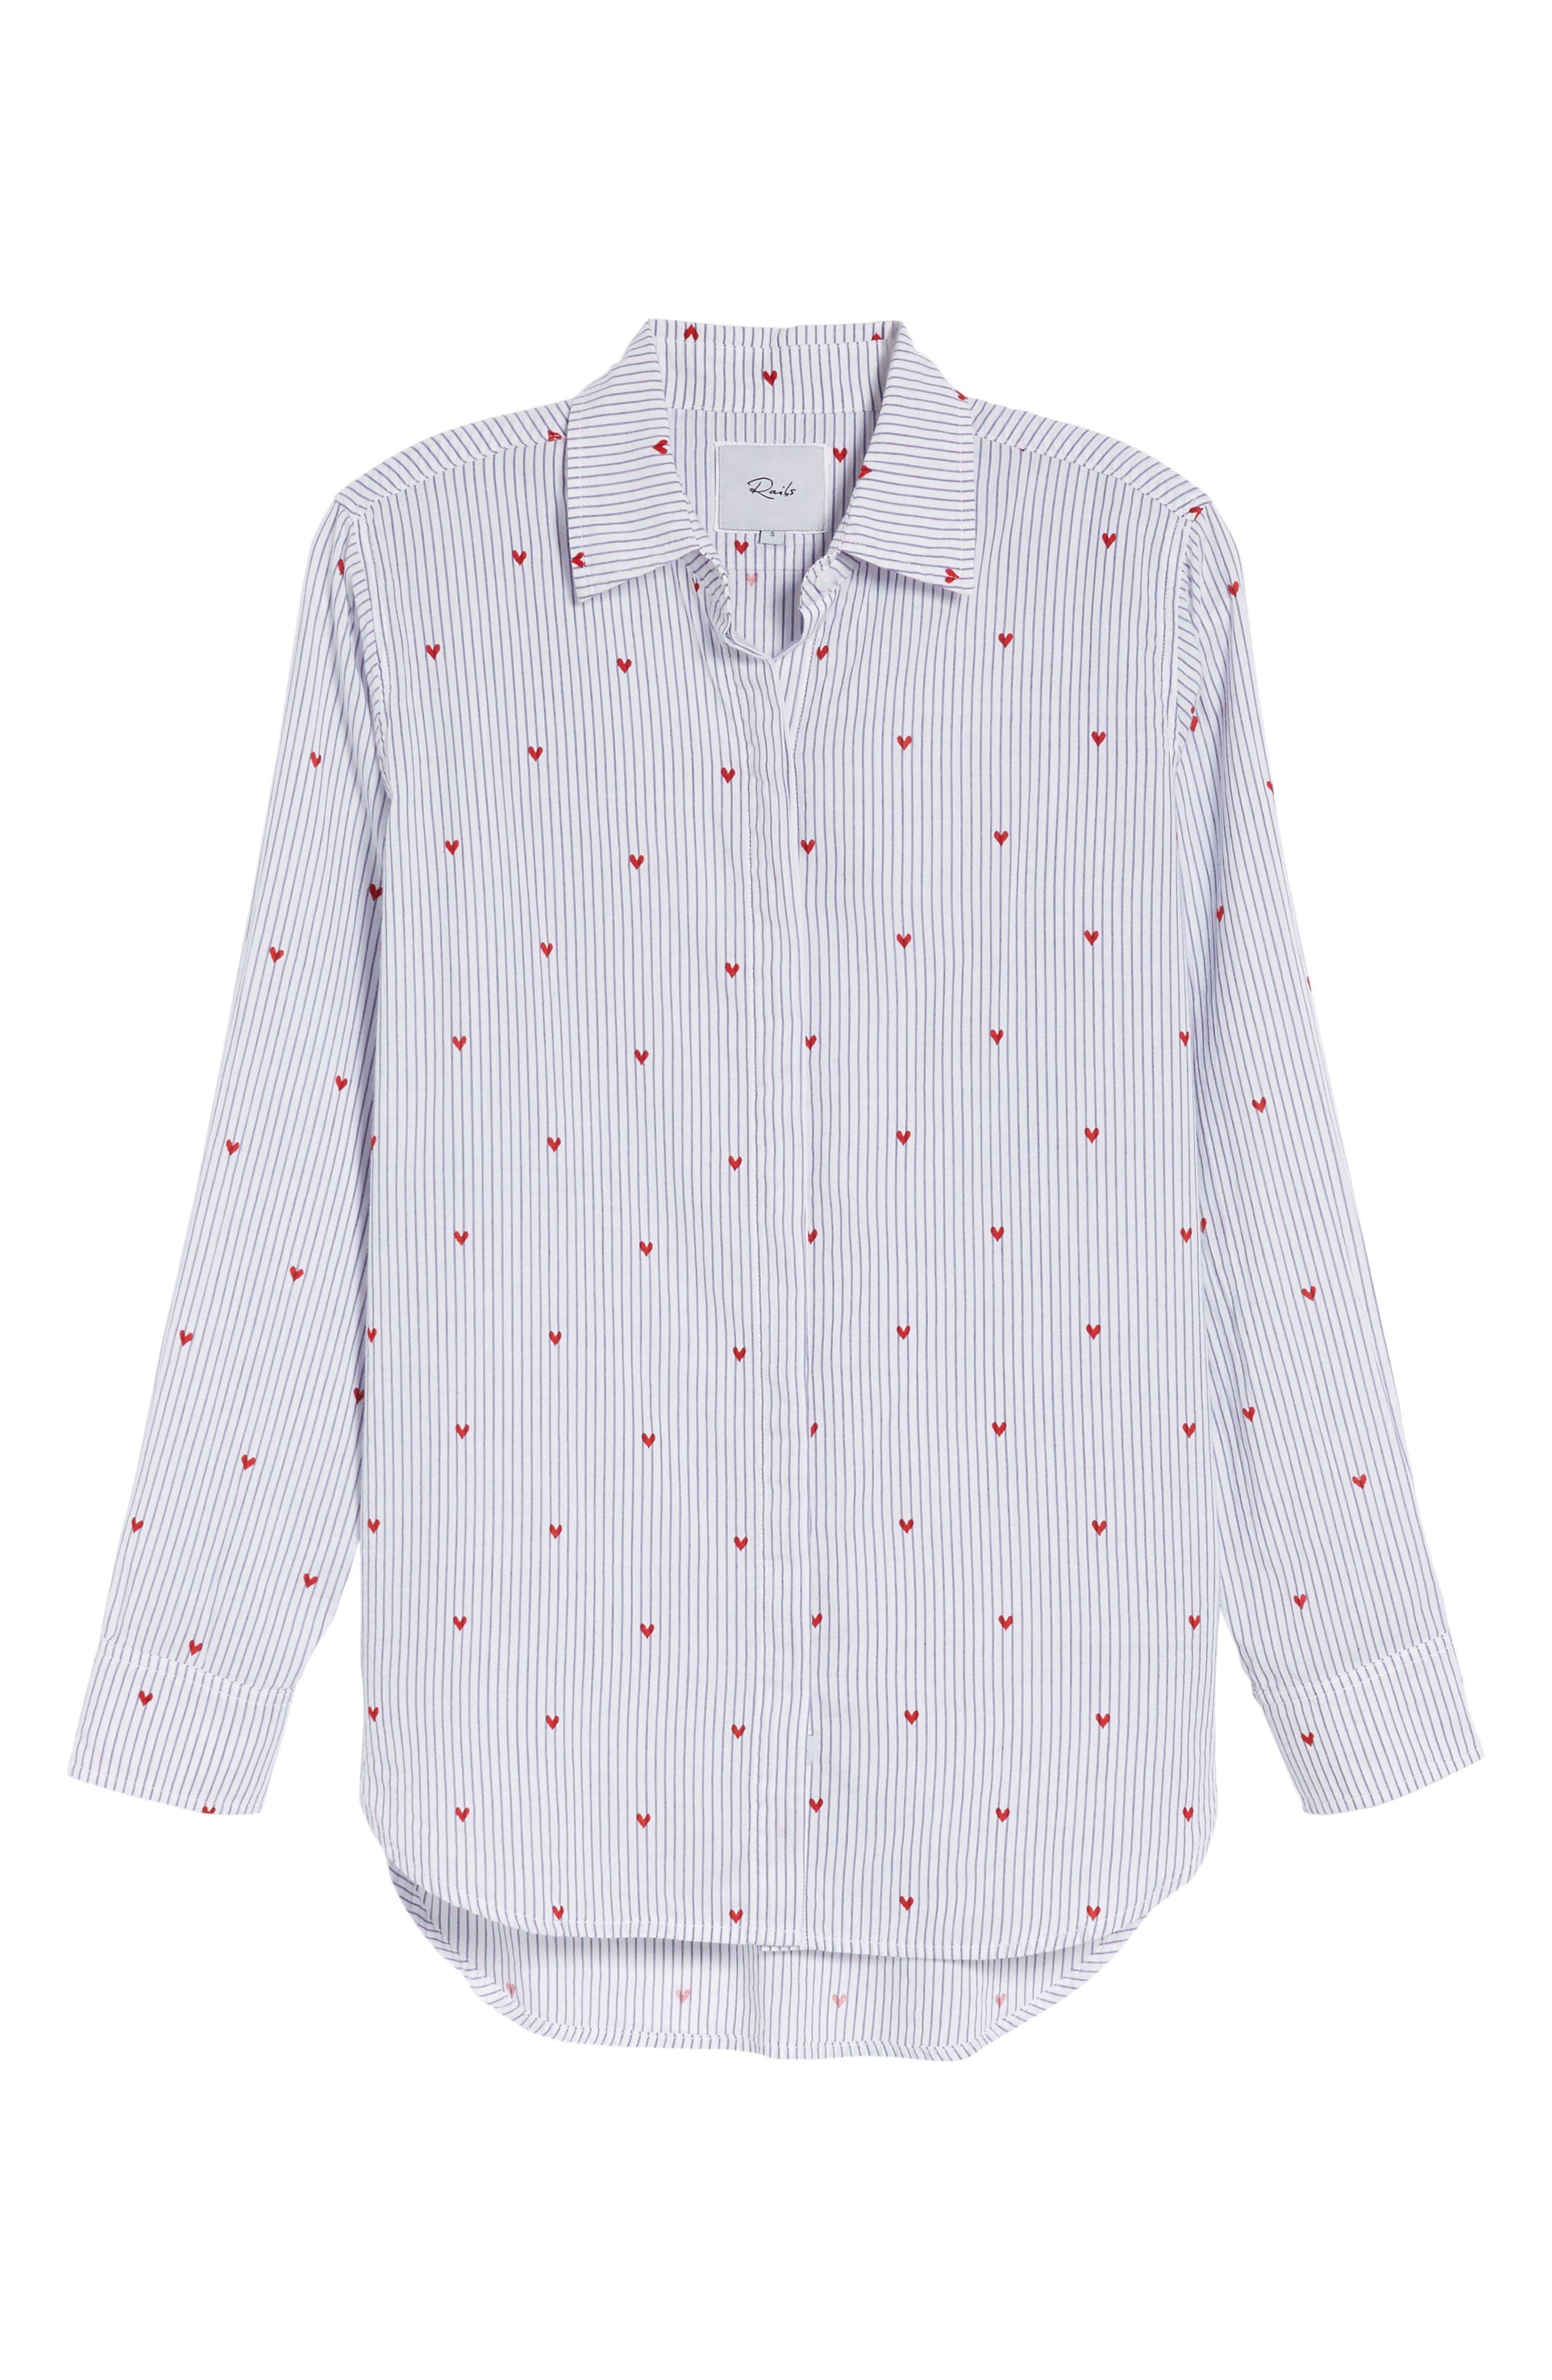 Taylor Heart Stripe Shirt,                             Alternate thumbnail 6, color,                             400